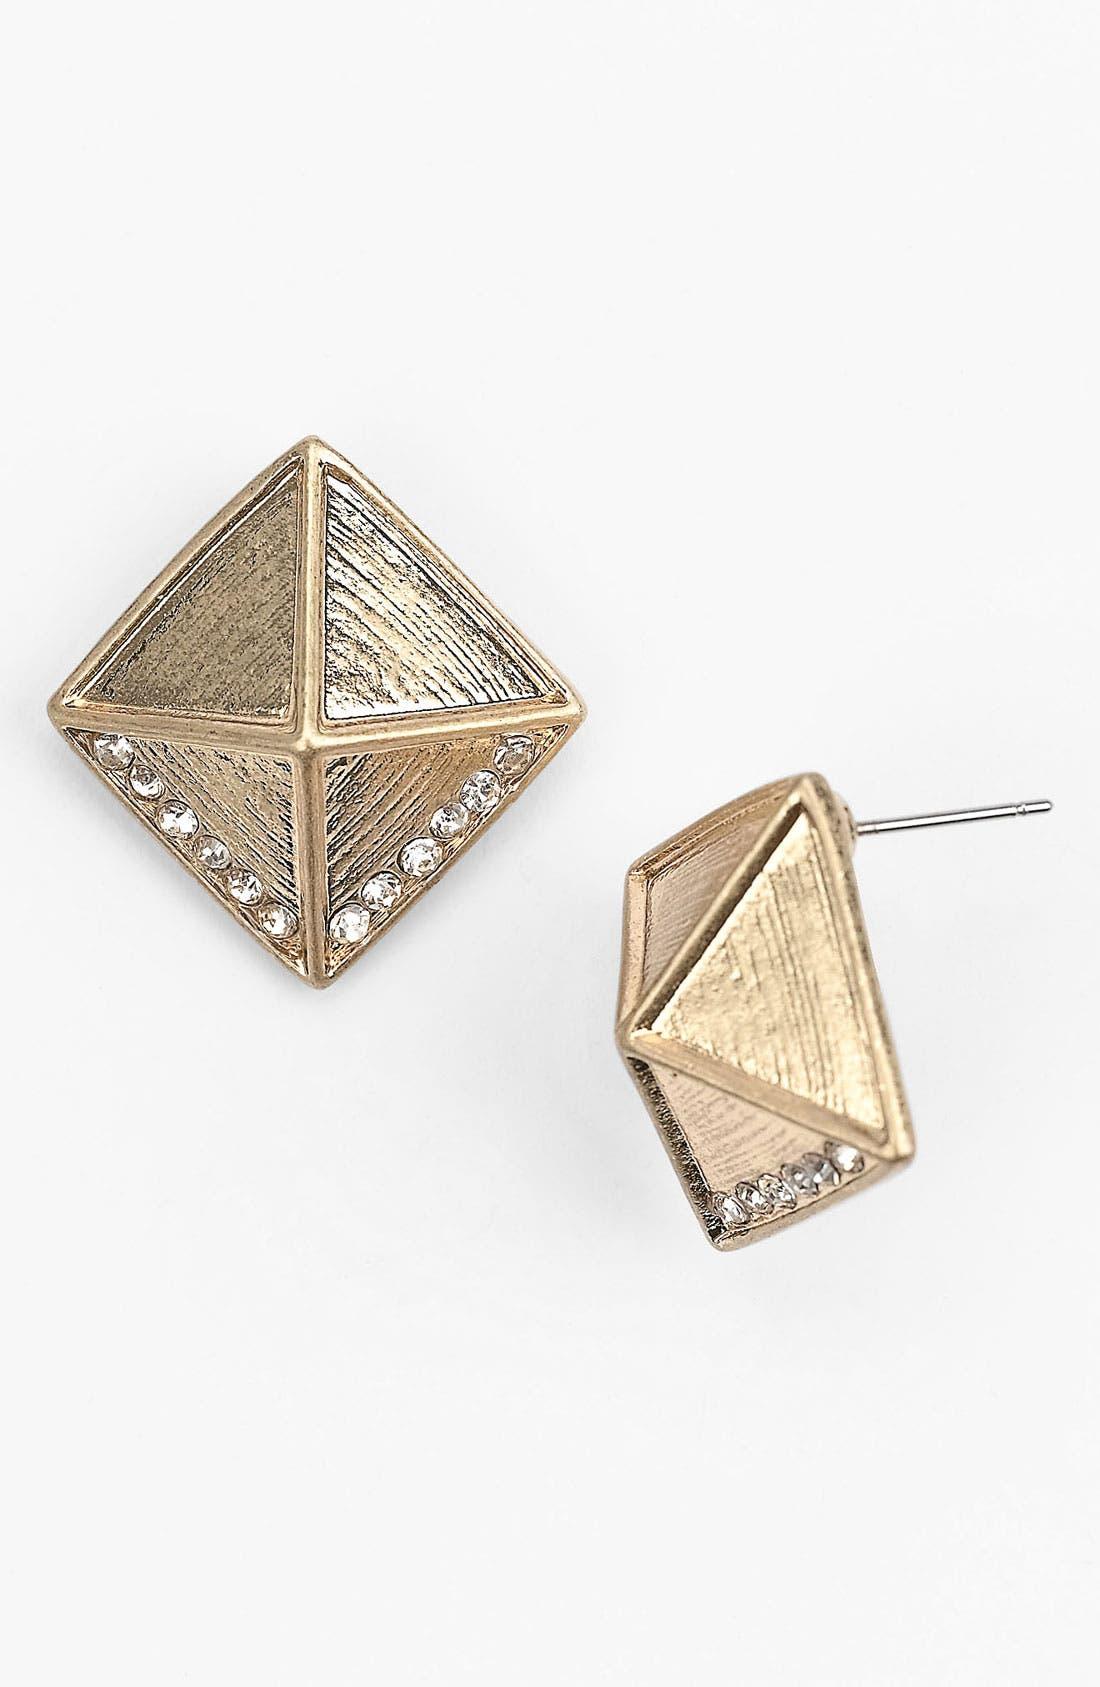 Alternate Image 1 Selected - BP. Rhinestone Pyramid Stud Earrings